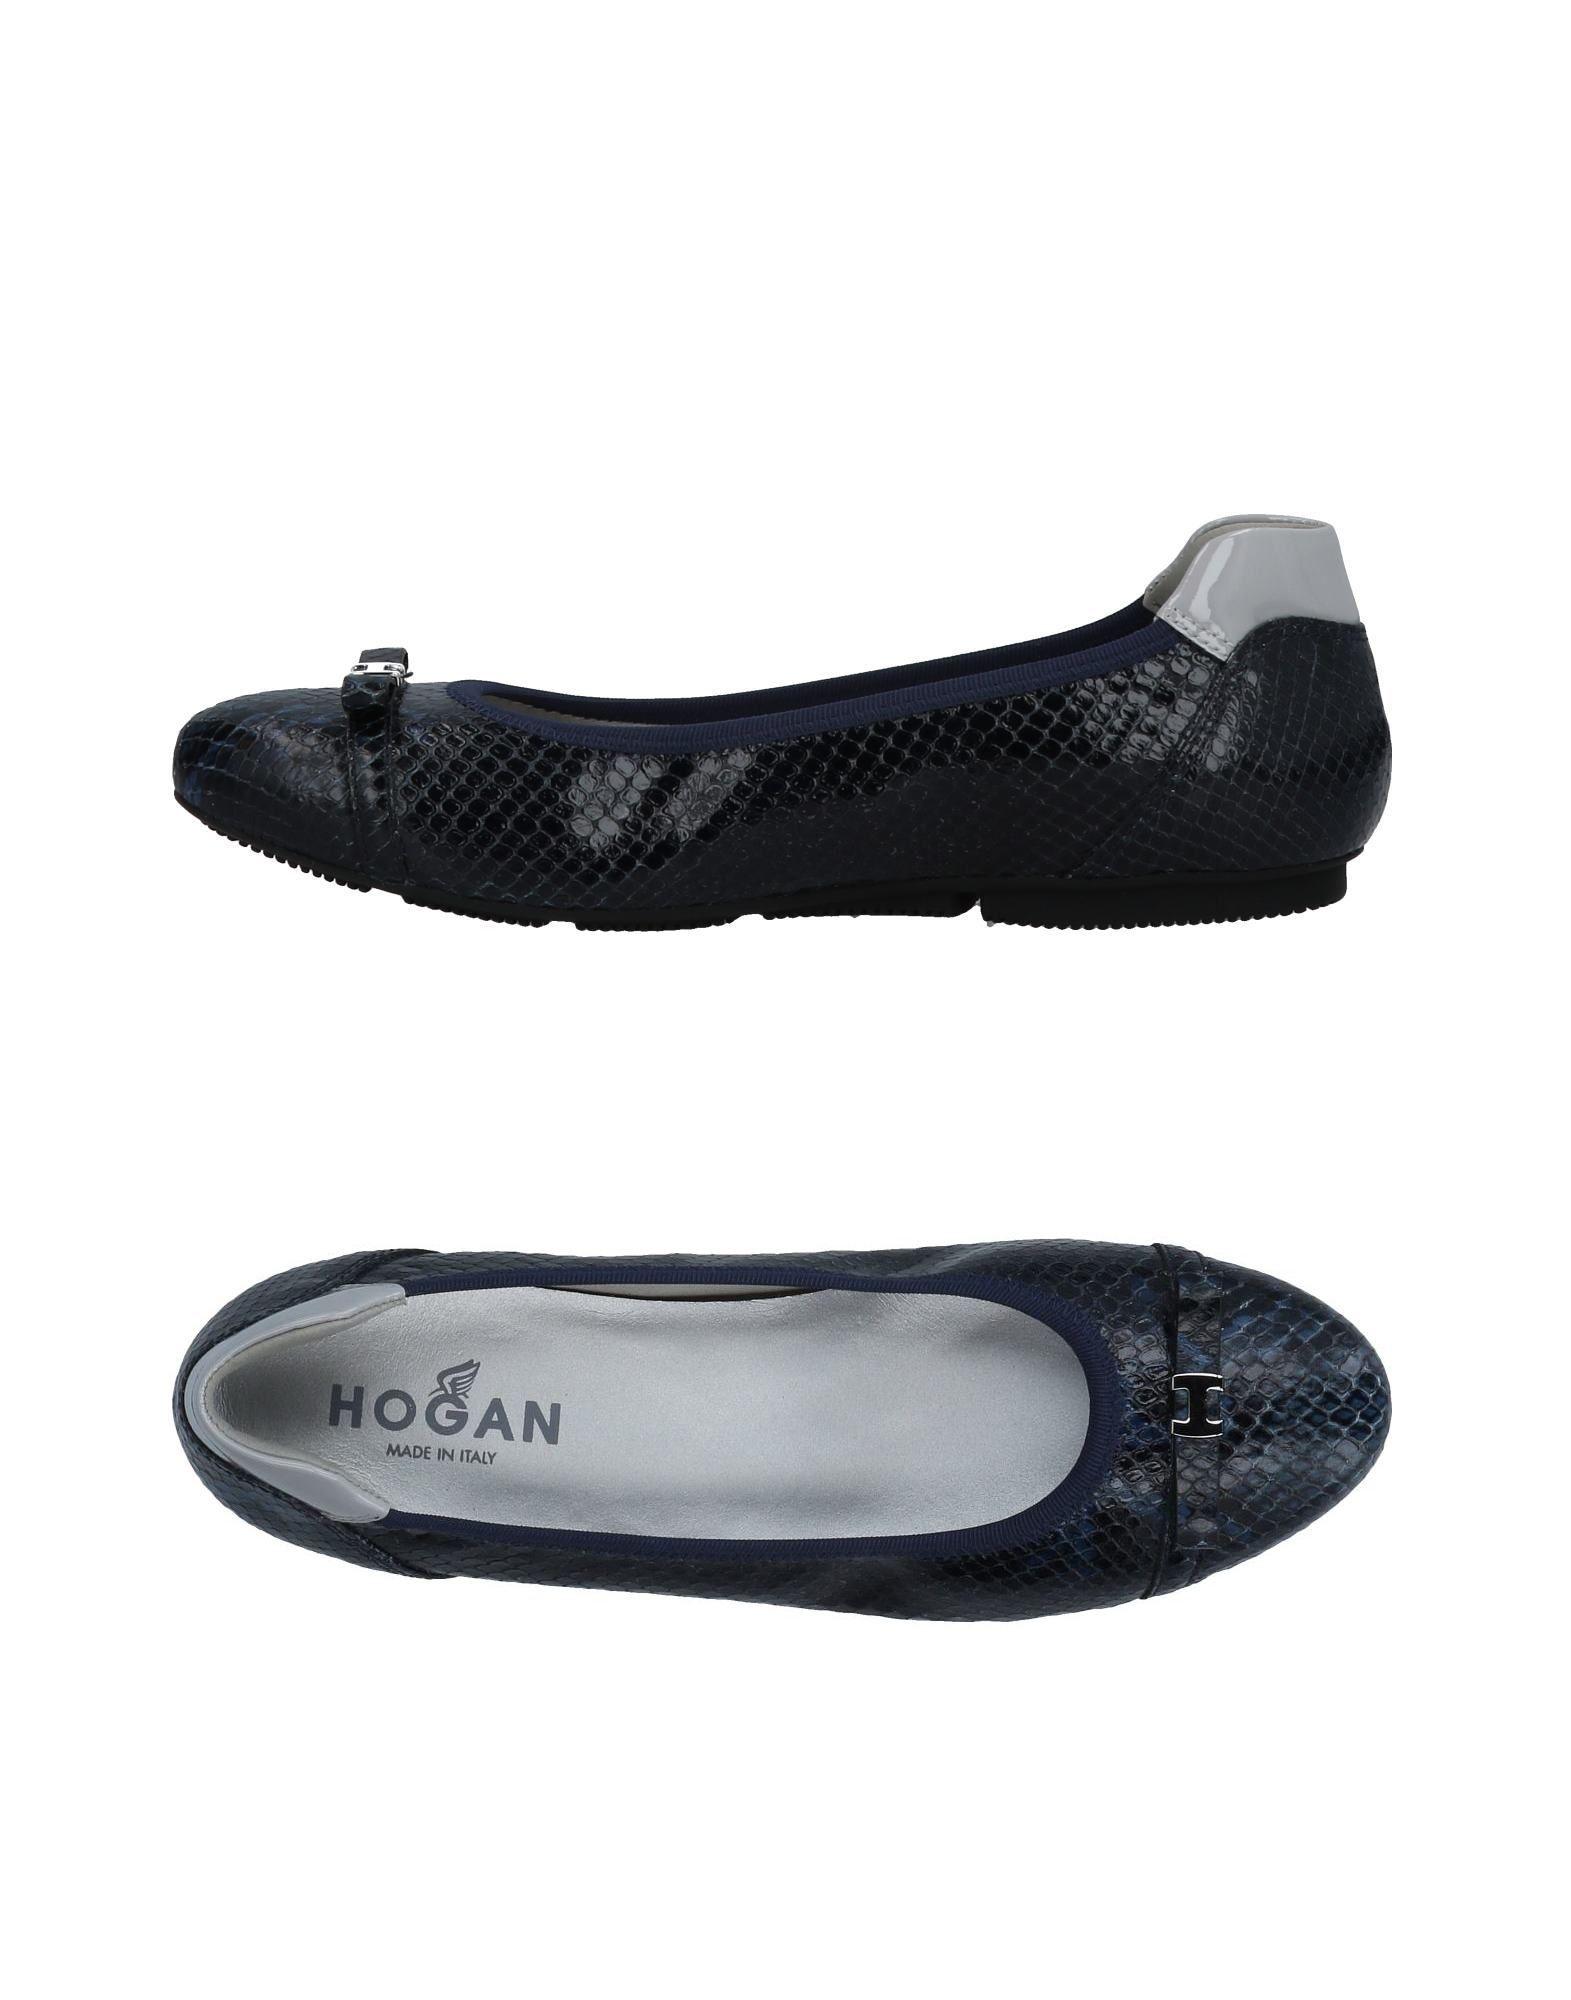 Ballet Flats Ballerina Shoes for Women On Sale, Dark Blue, Leather, 2017, 5.5 Hogan